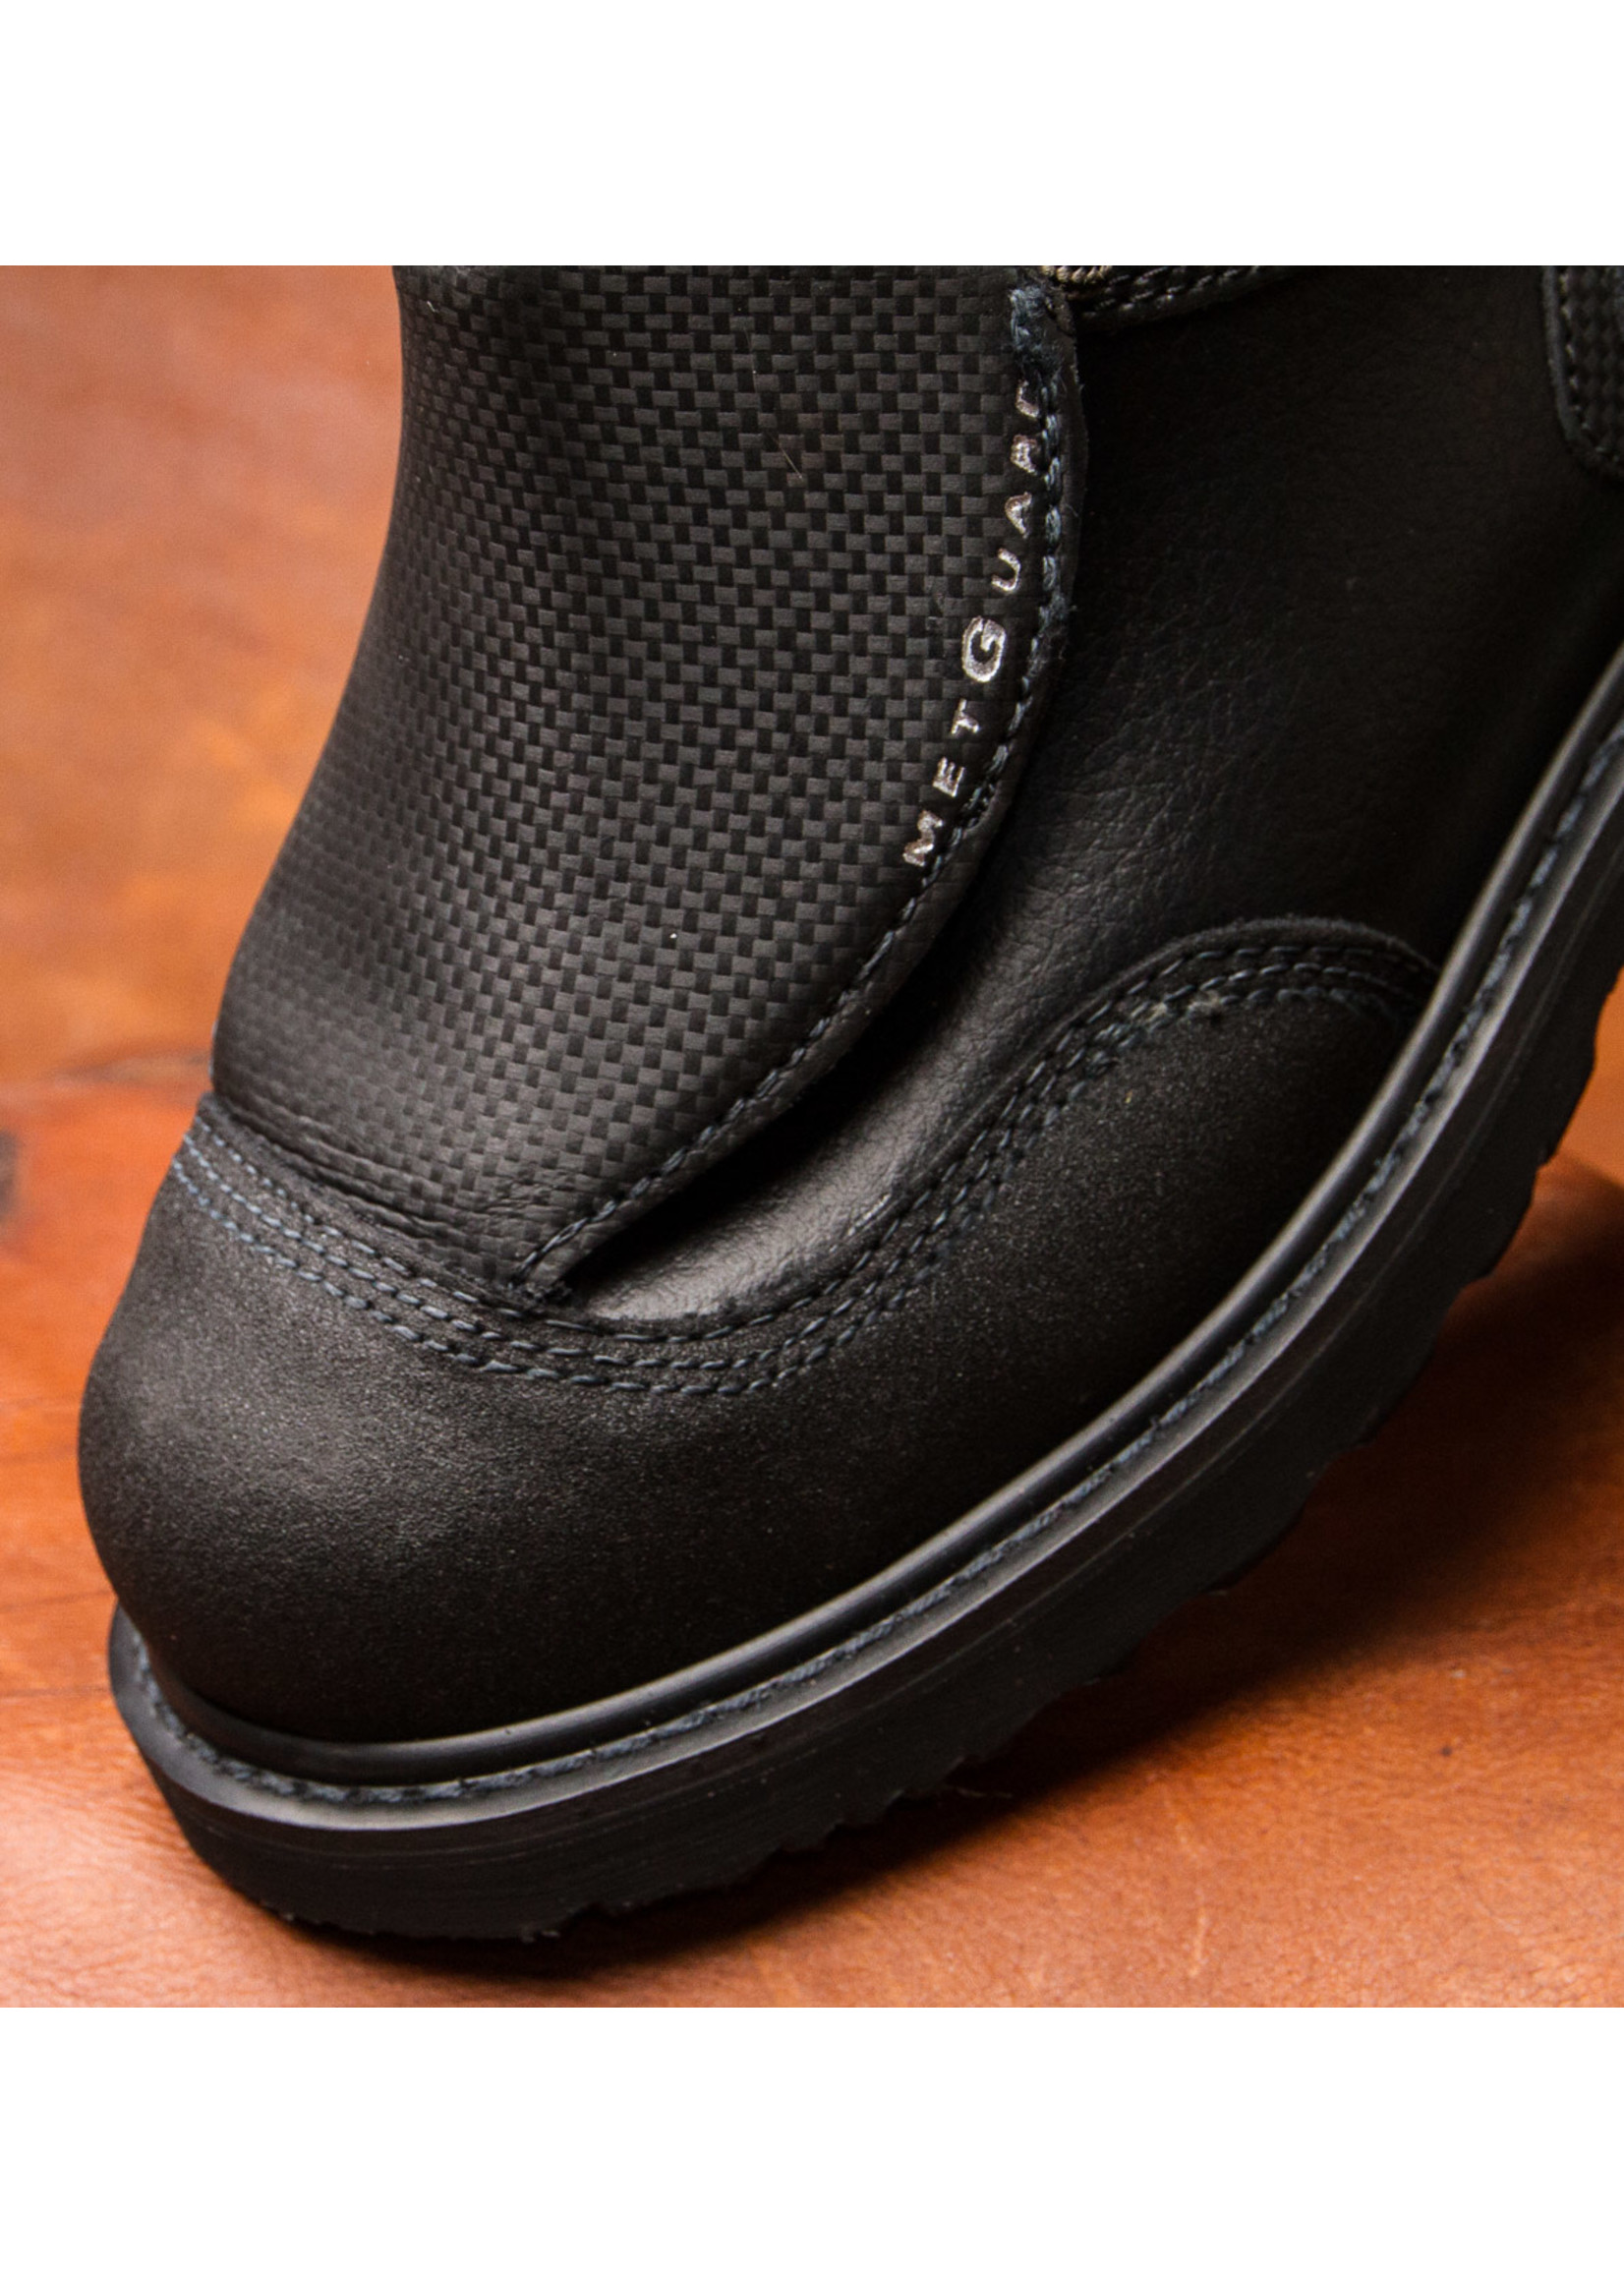 Timberland Pro Men's Metatarsal Guard Steel Toe Work Boots 40000